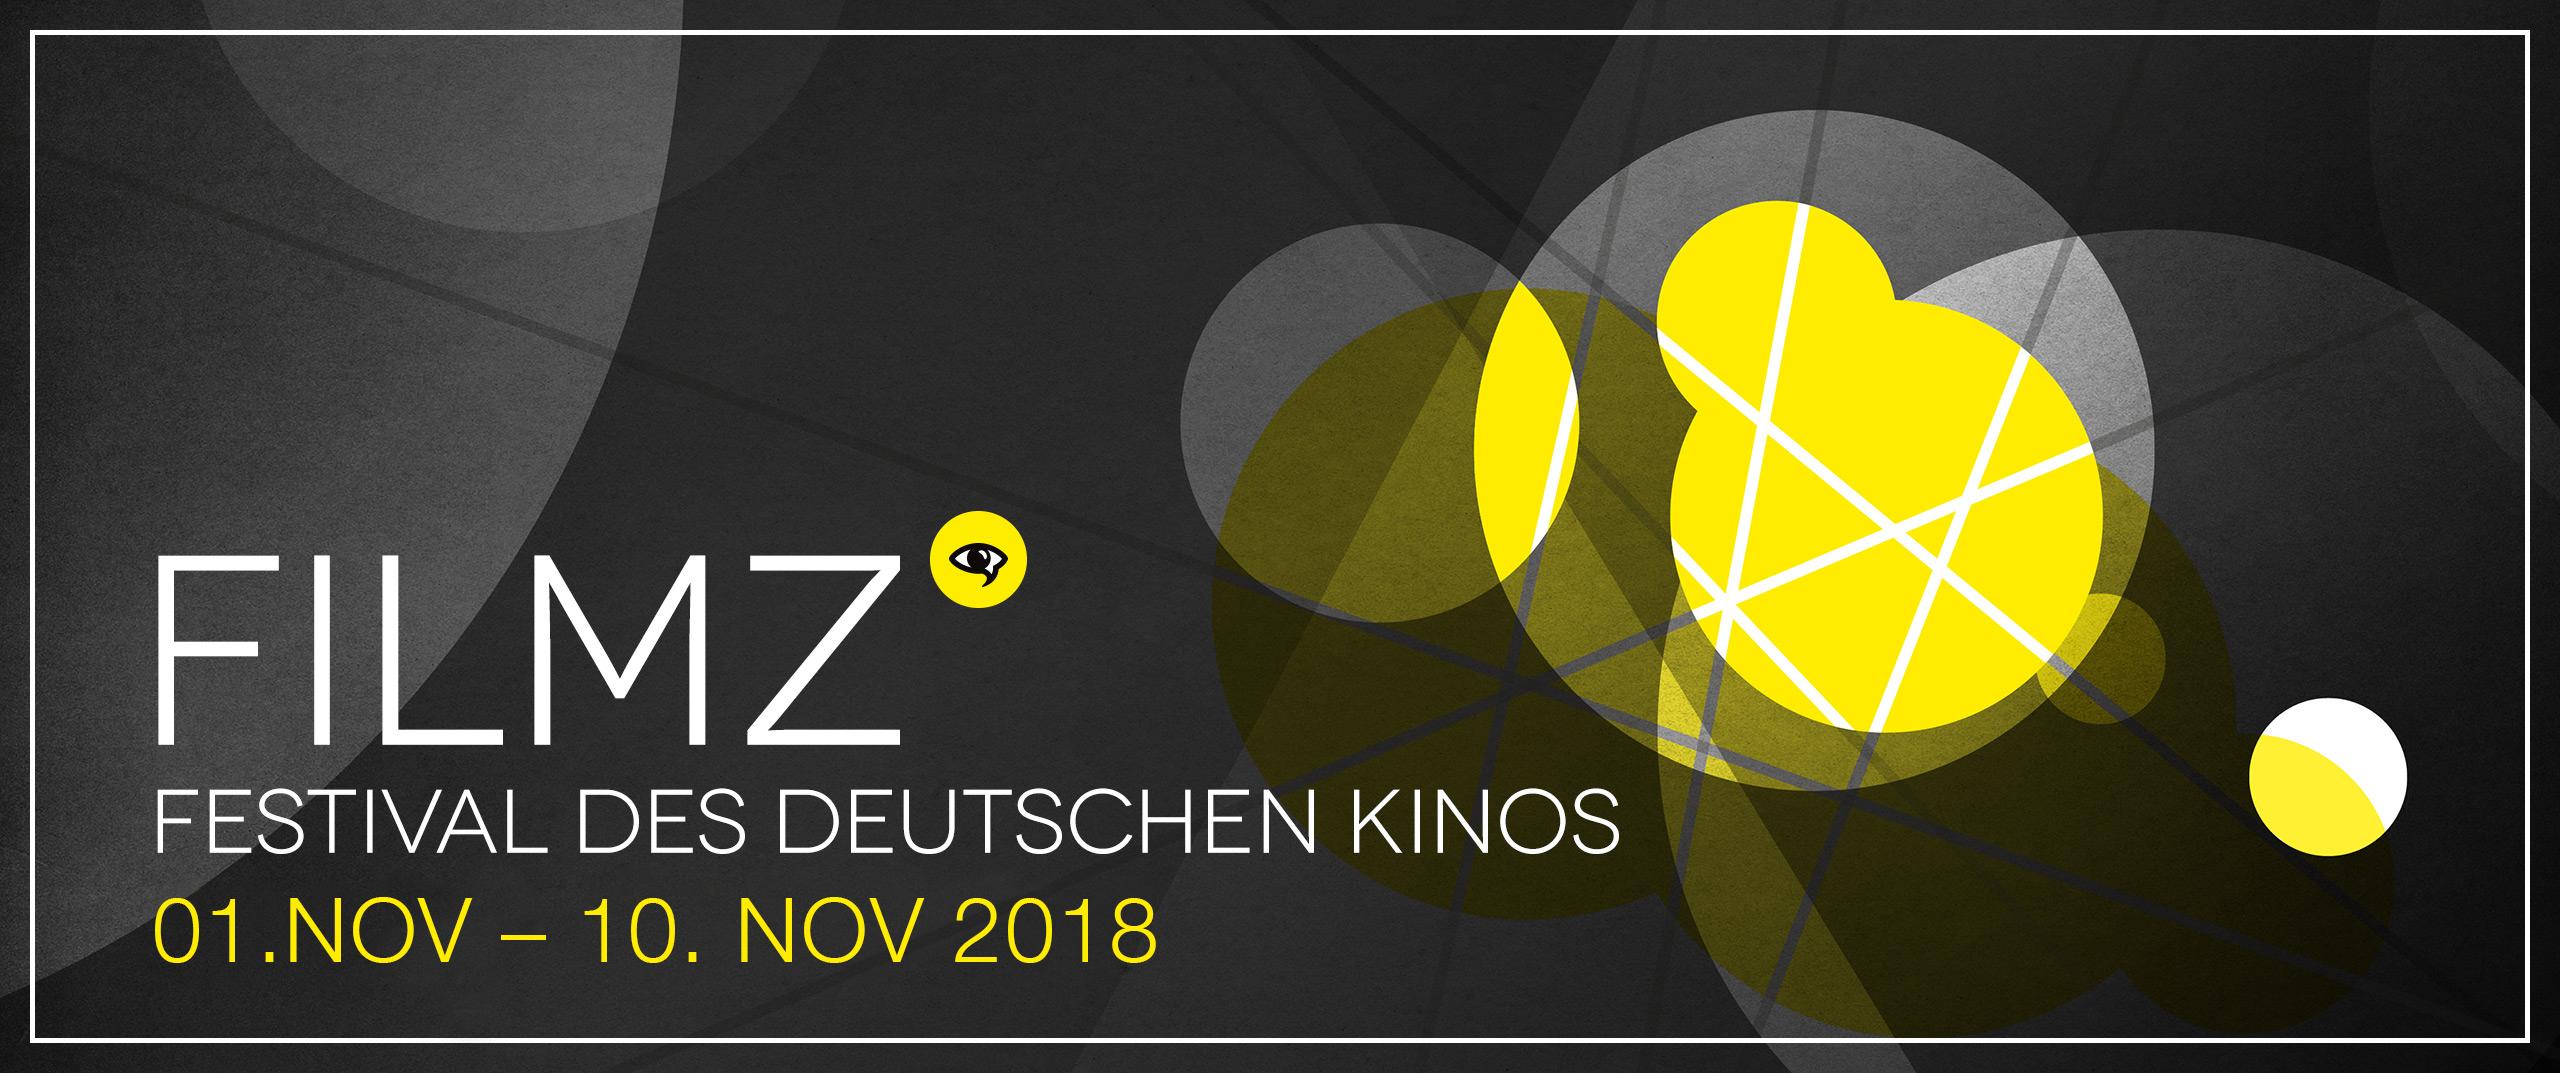 Filmz - Festival des deutschen Kinos // 01. Nov - 10. Nov 2018